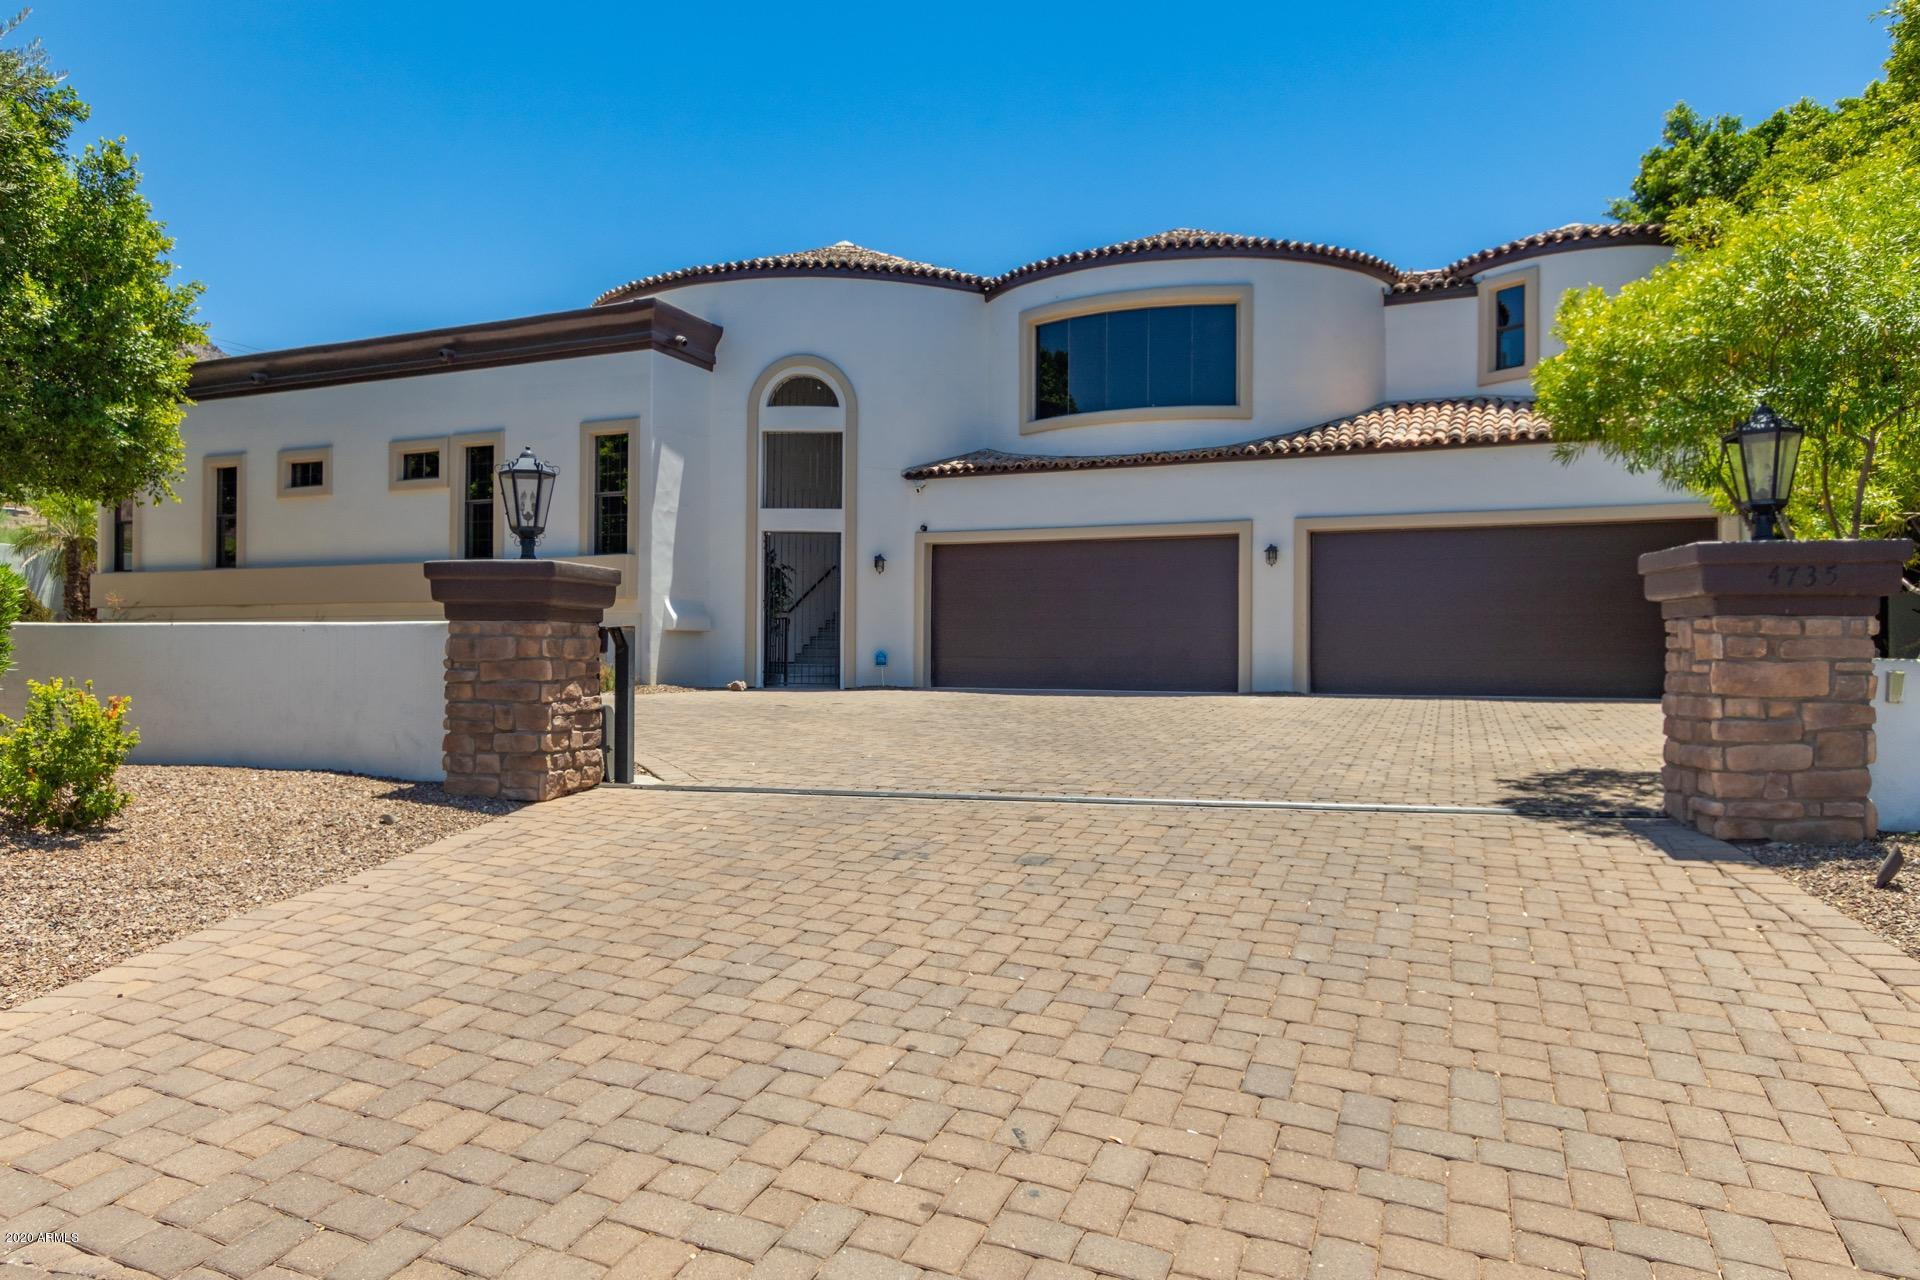 Photo of 4735 N LAUNFAL Avenue, Phoenix, AZ 85018